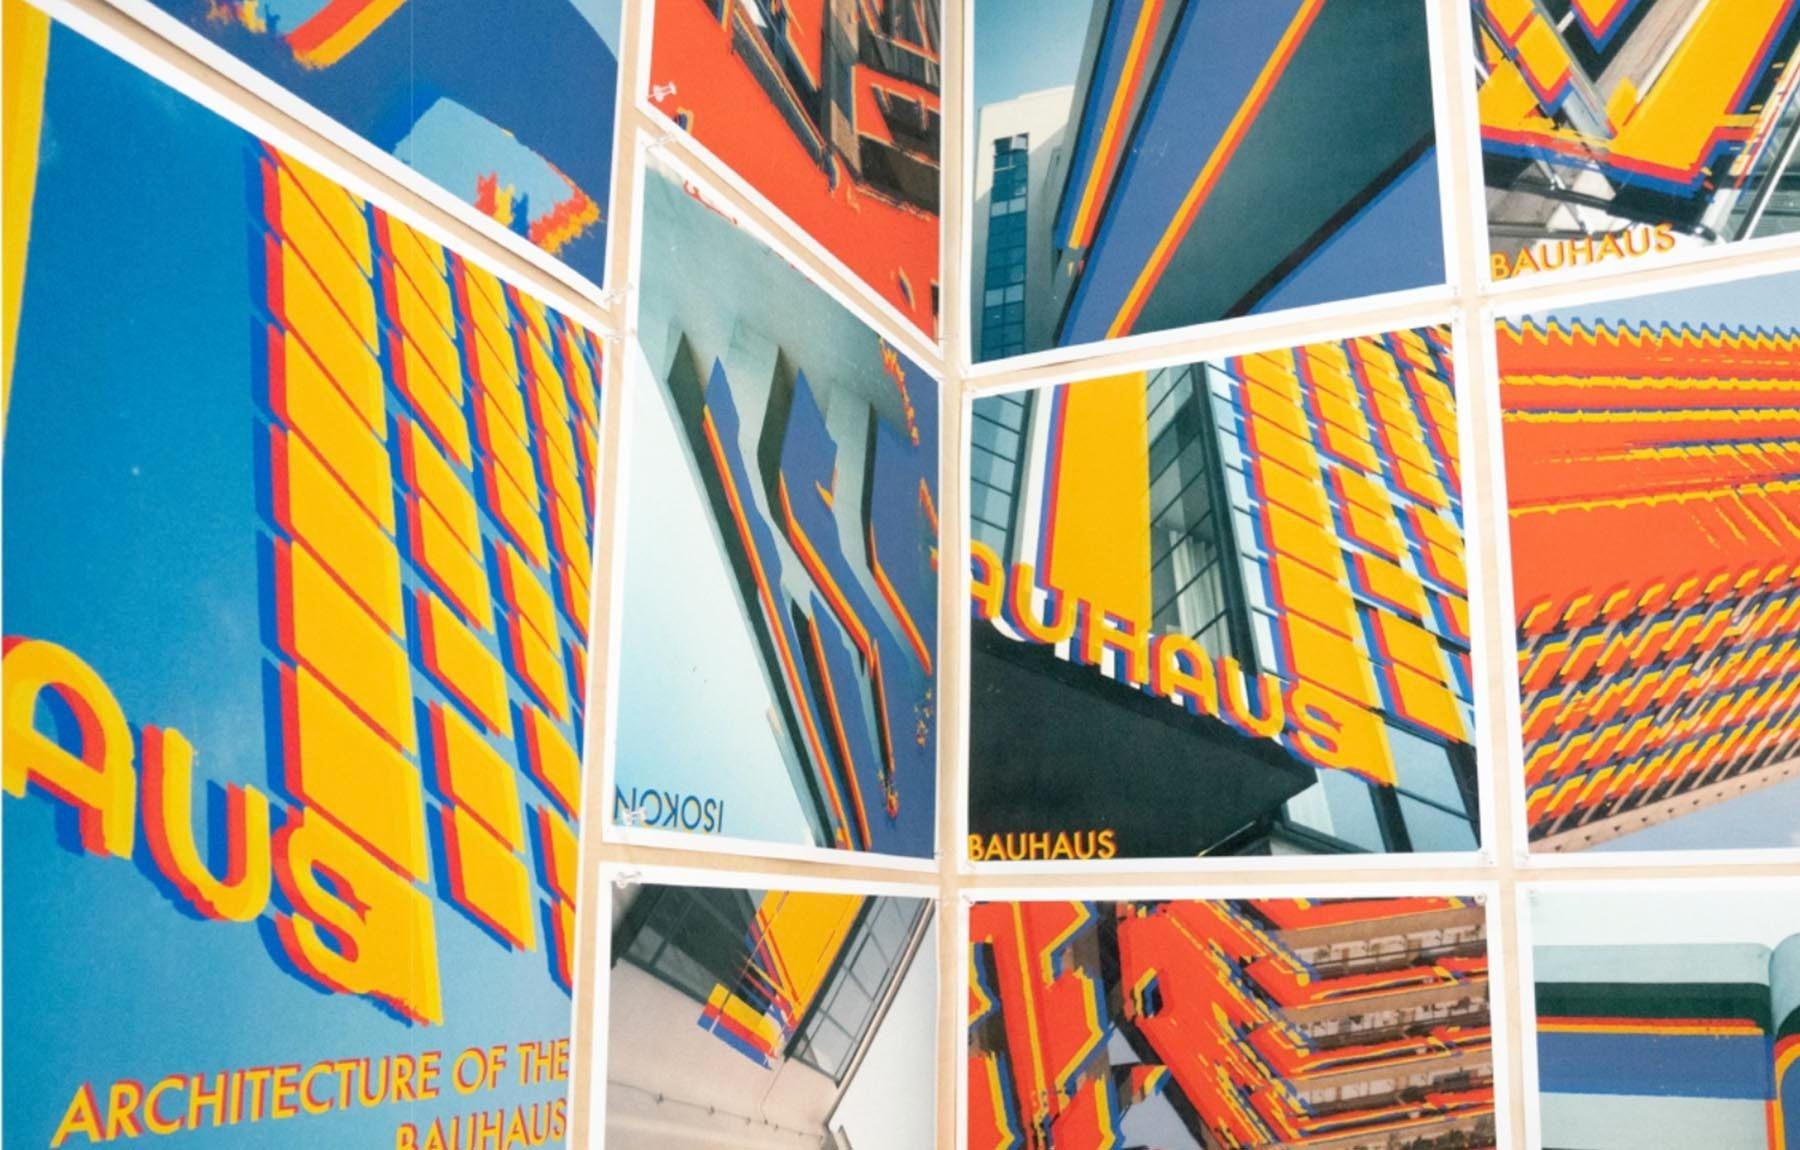 Adele Richardson-Smith, BA Graphic Design, UCA Canterbury